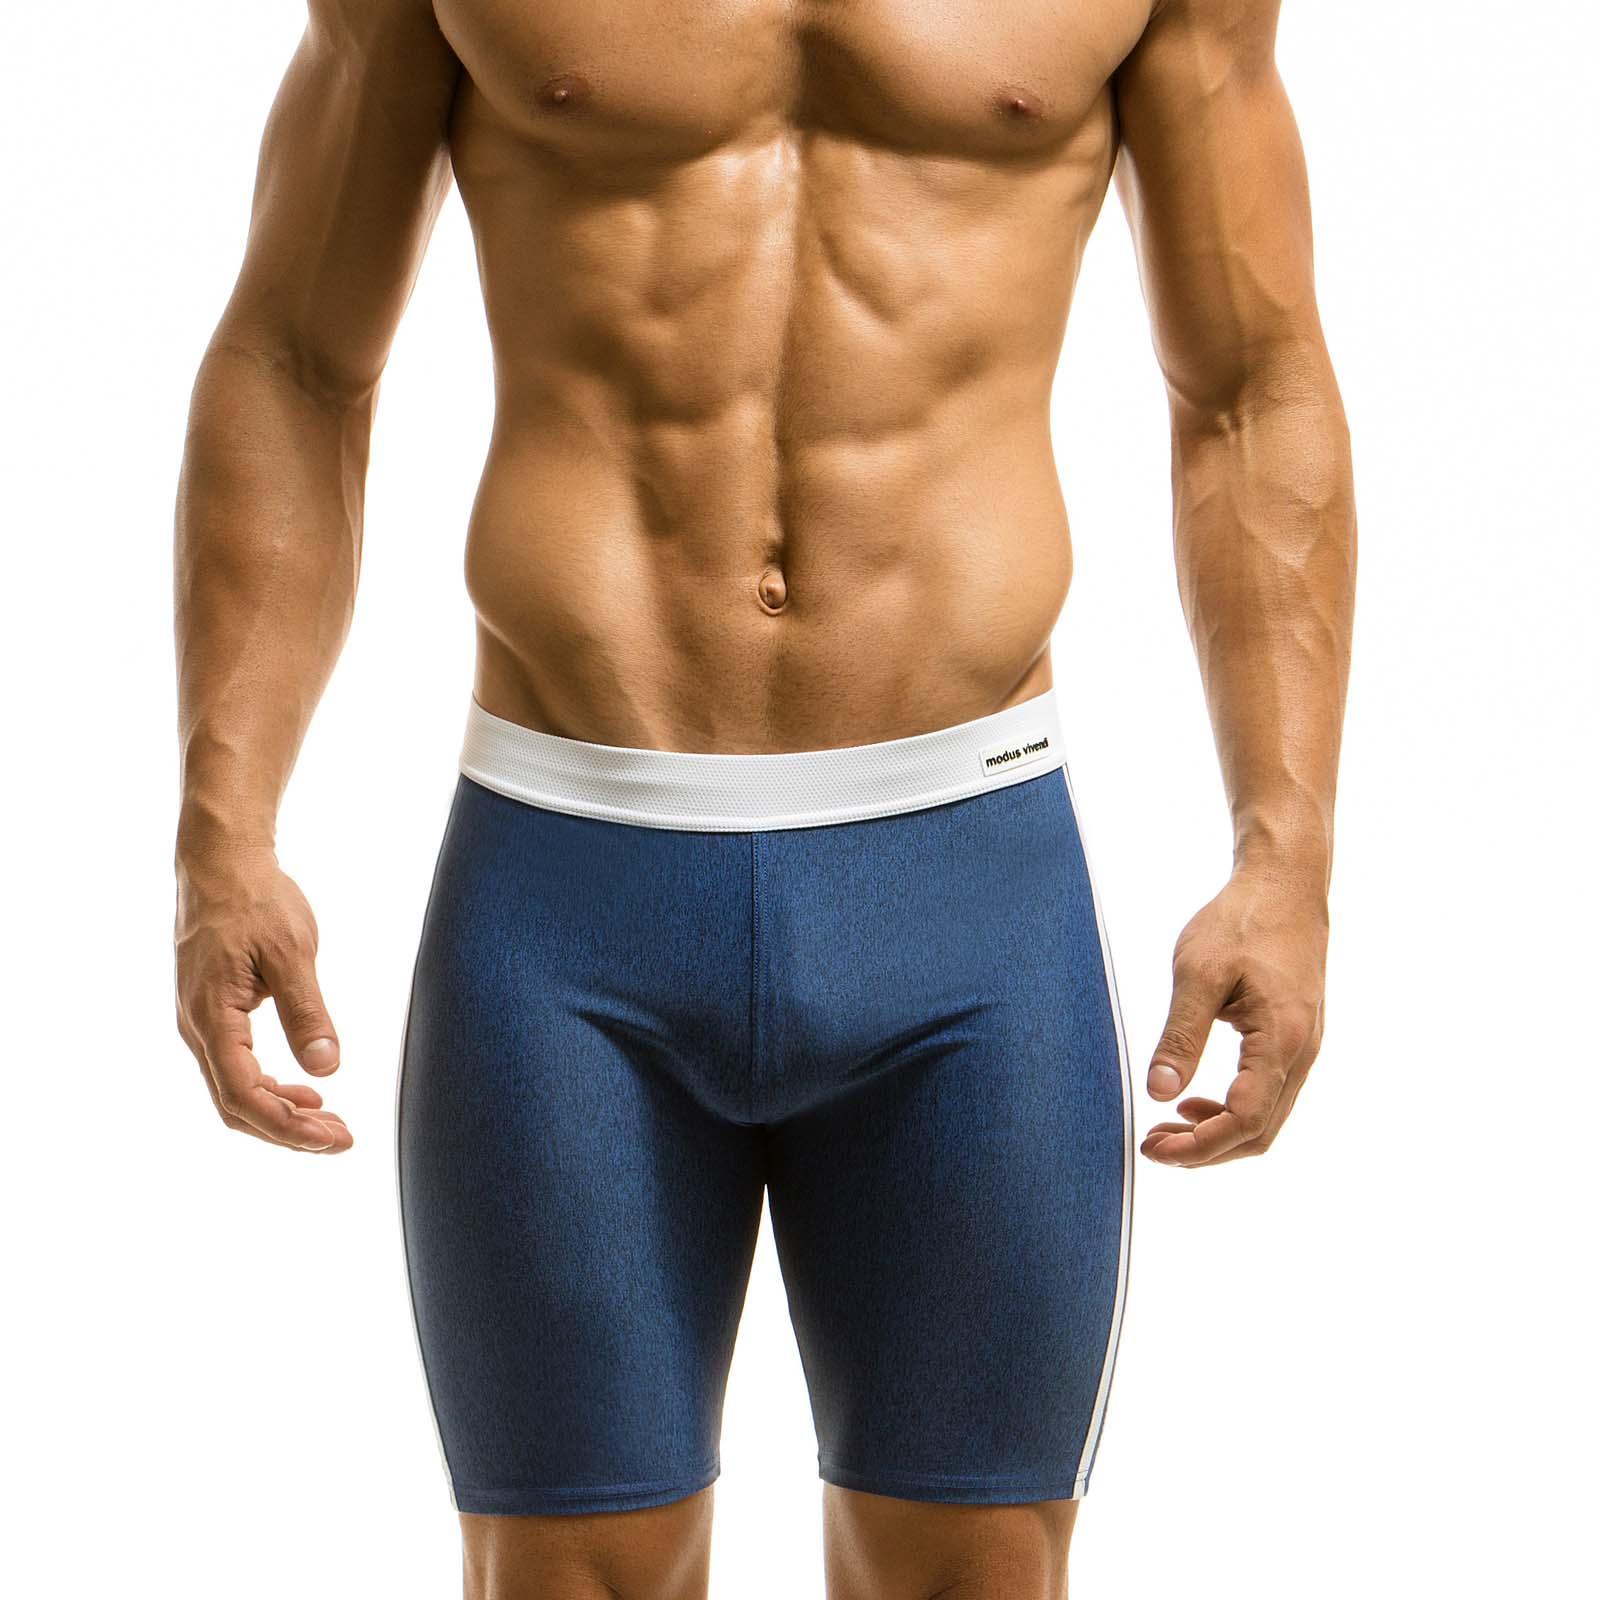 Boxer de bain Modus Vivendi Biker style S1725